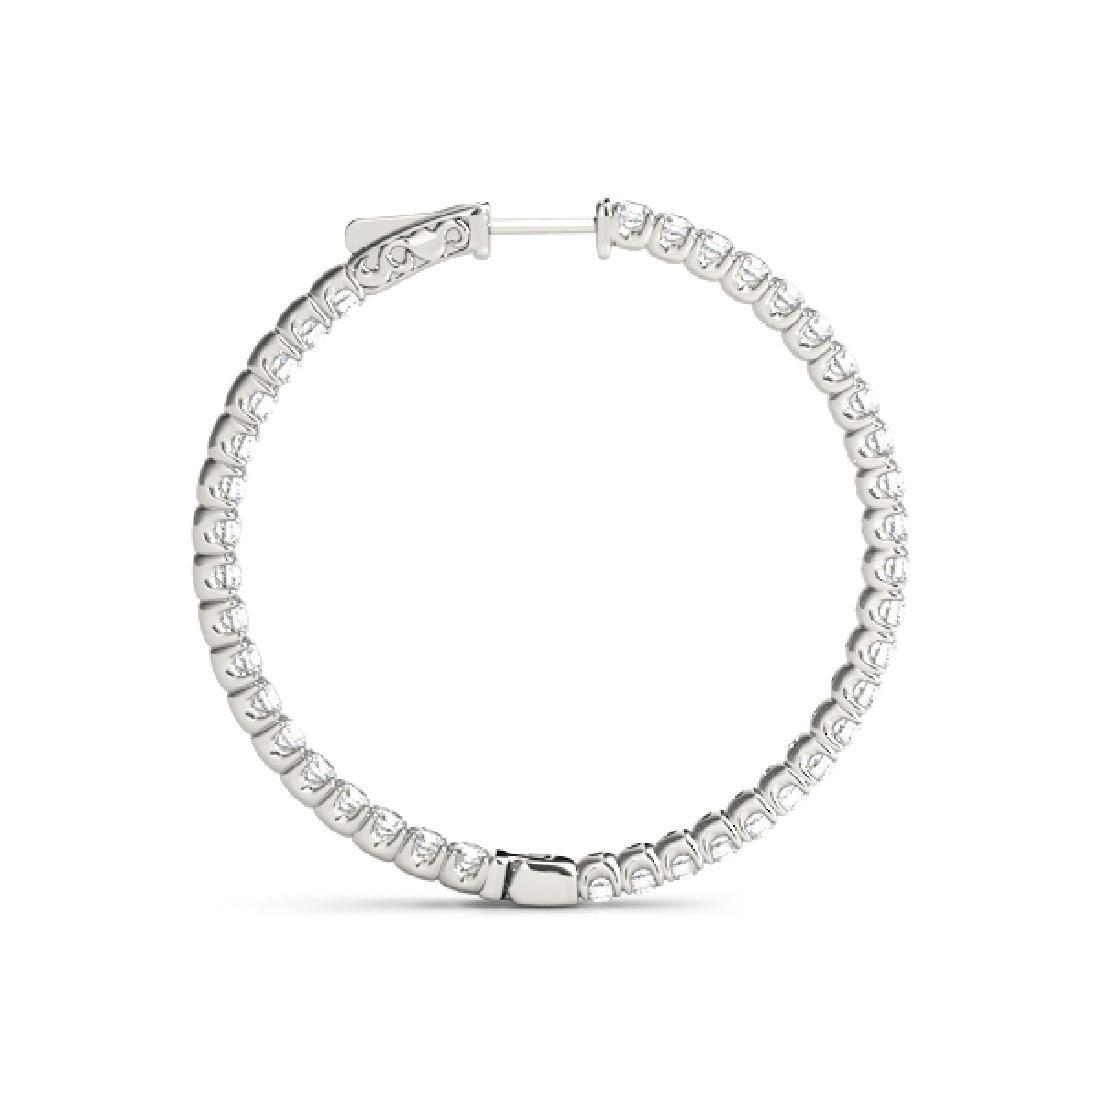 5.5 CTW Diamond VS/SI Certified 64 Mm Hoop Earrings 14K - 3